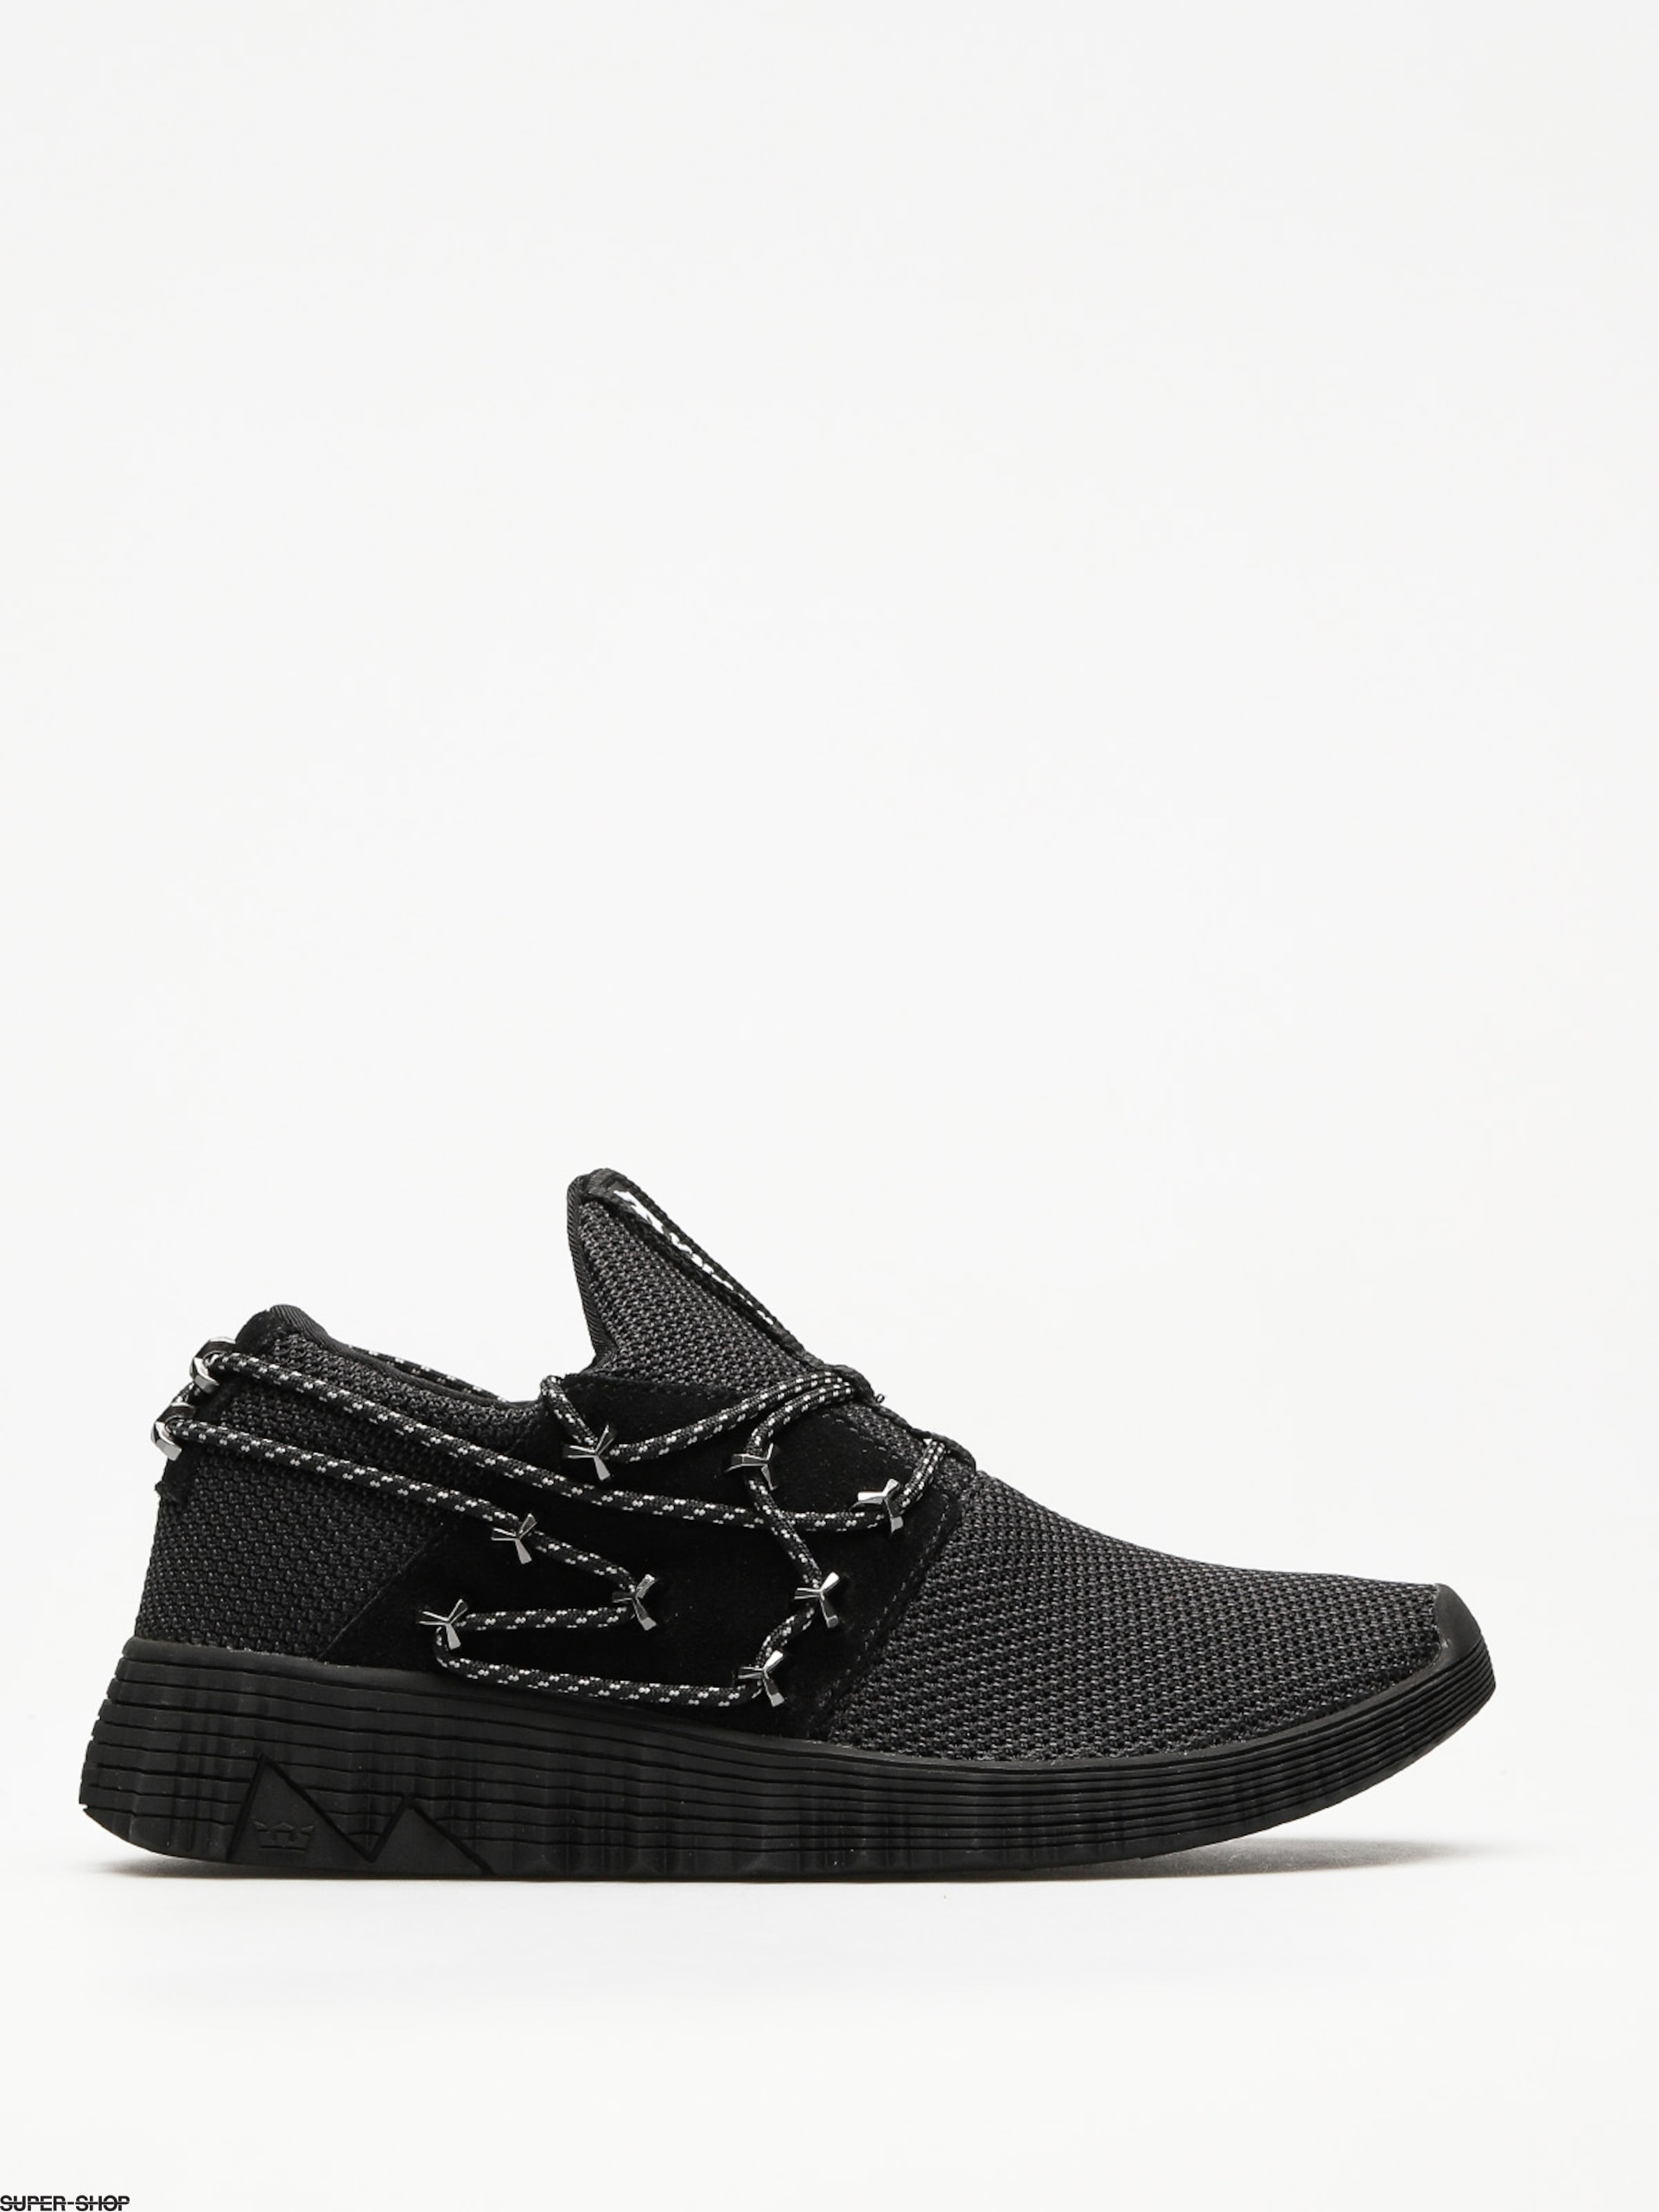 9f5fec2600b1 930074-w1920-supra-shoes-malli-black-black.jpg